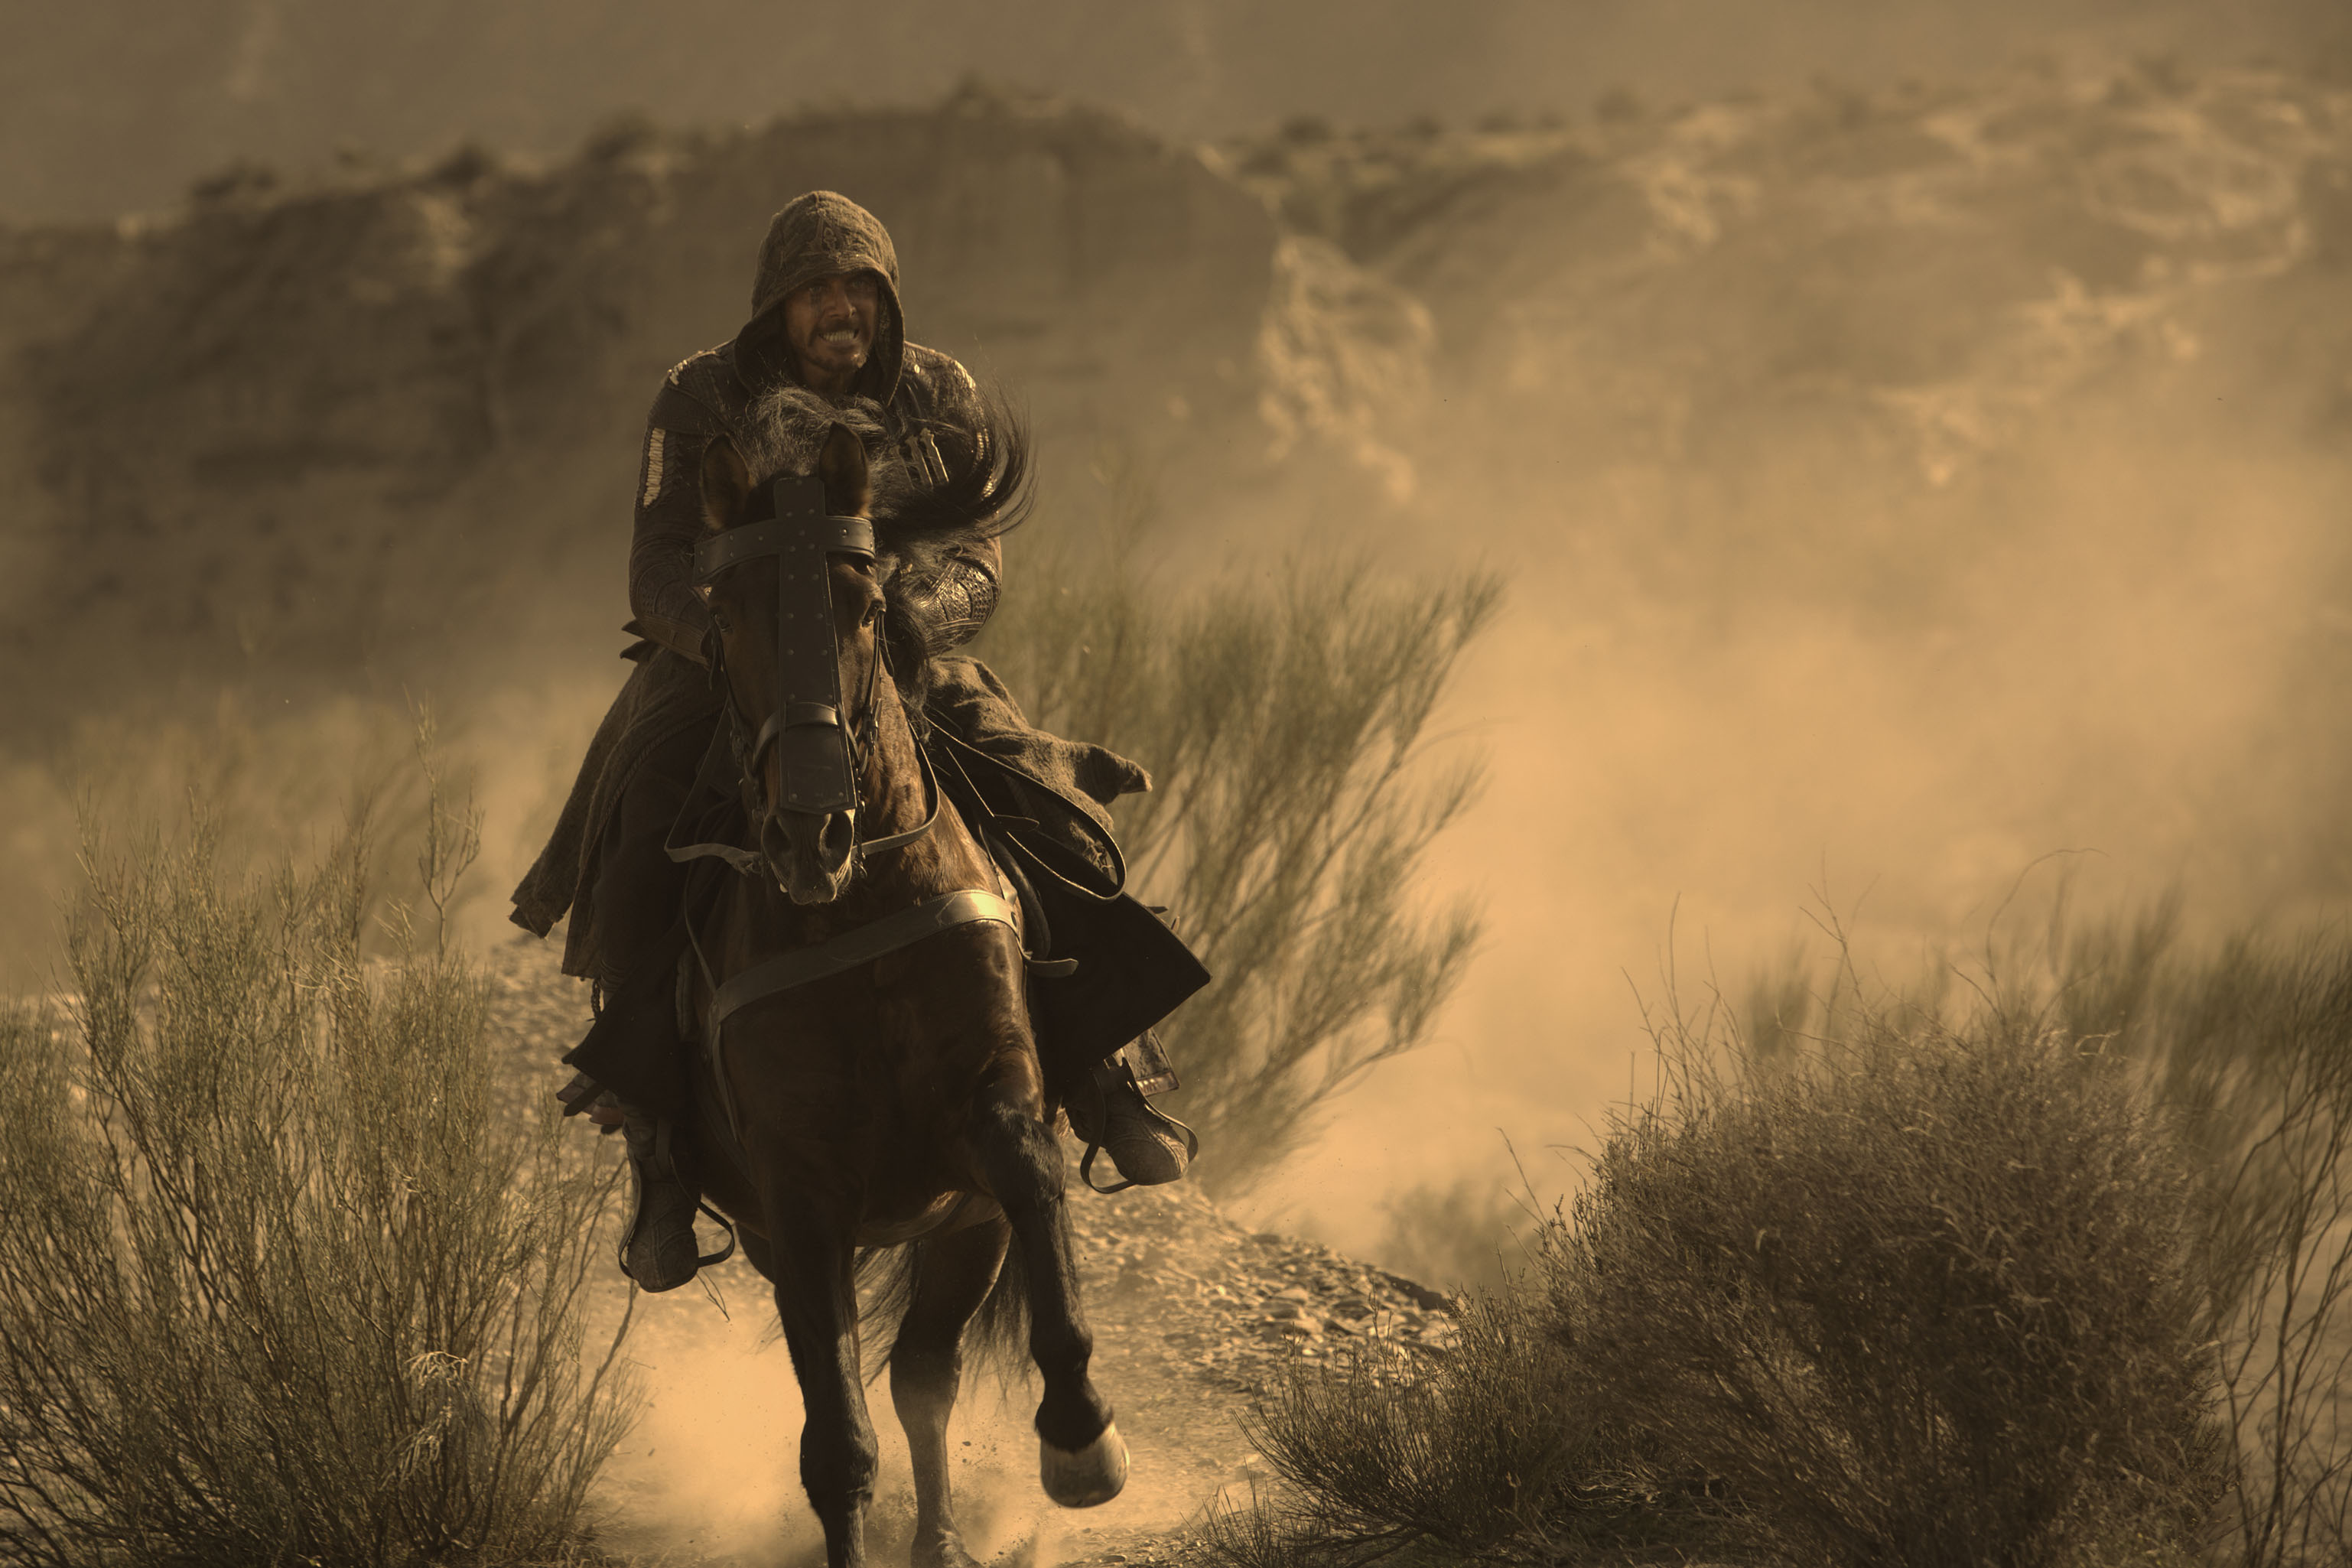 Aguilar Horseback Riding